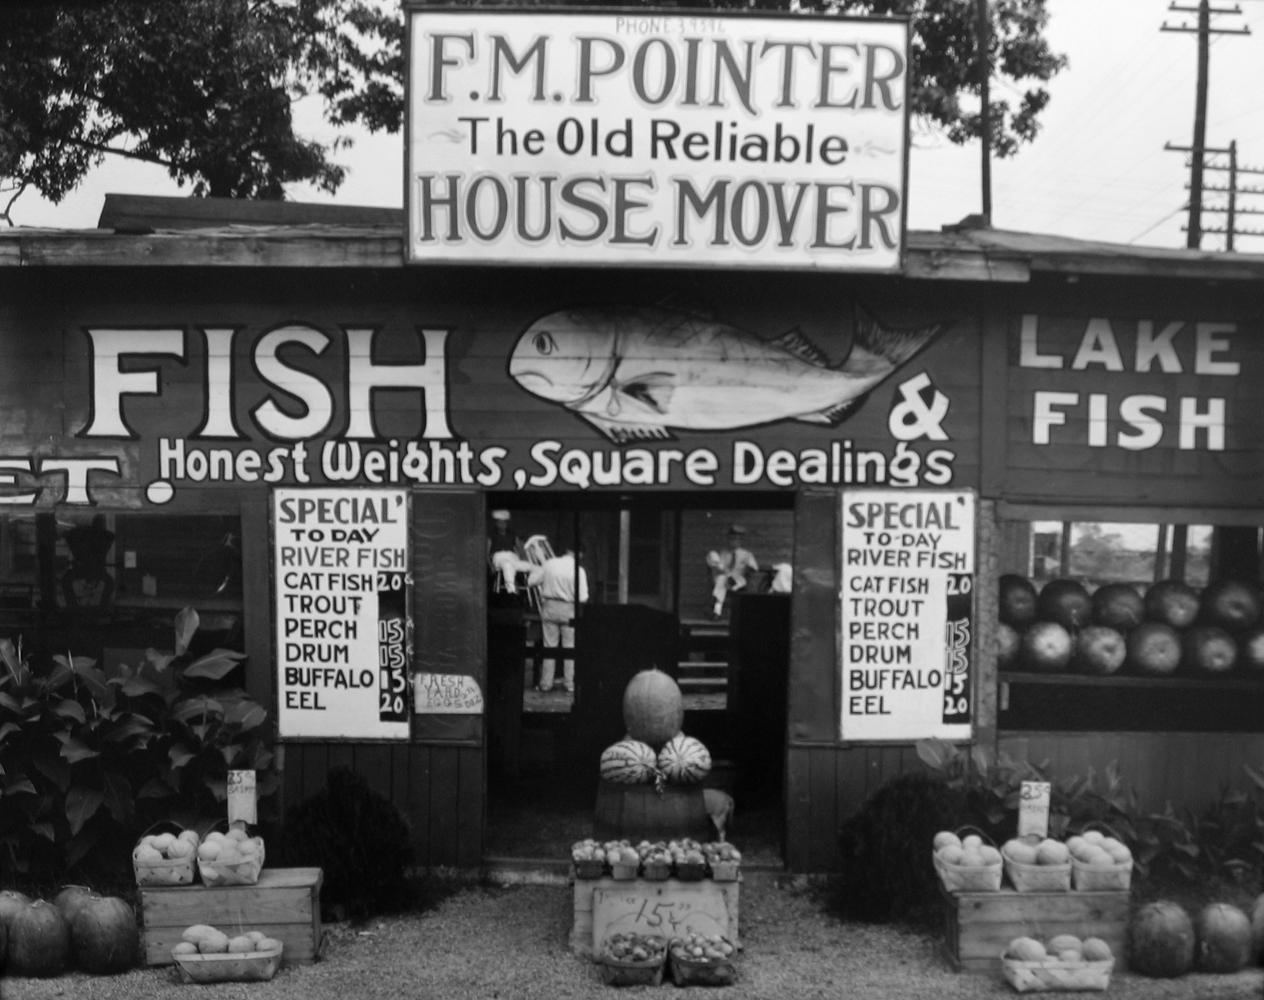 Walker Evans, Fish Market Near Birmingham, Ala., 1936, gelatin silver print, 8 x 10 inches